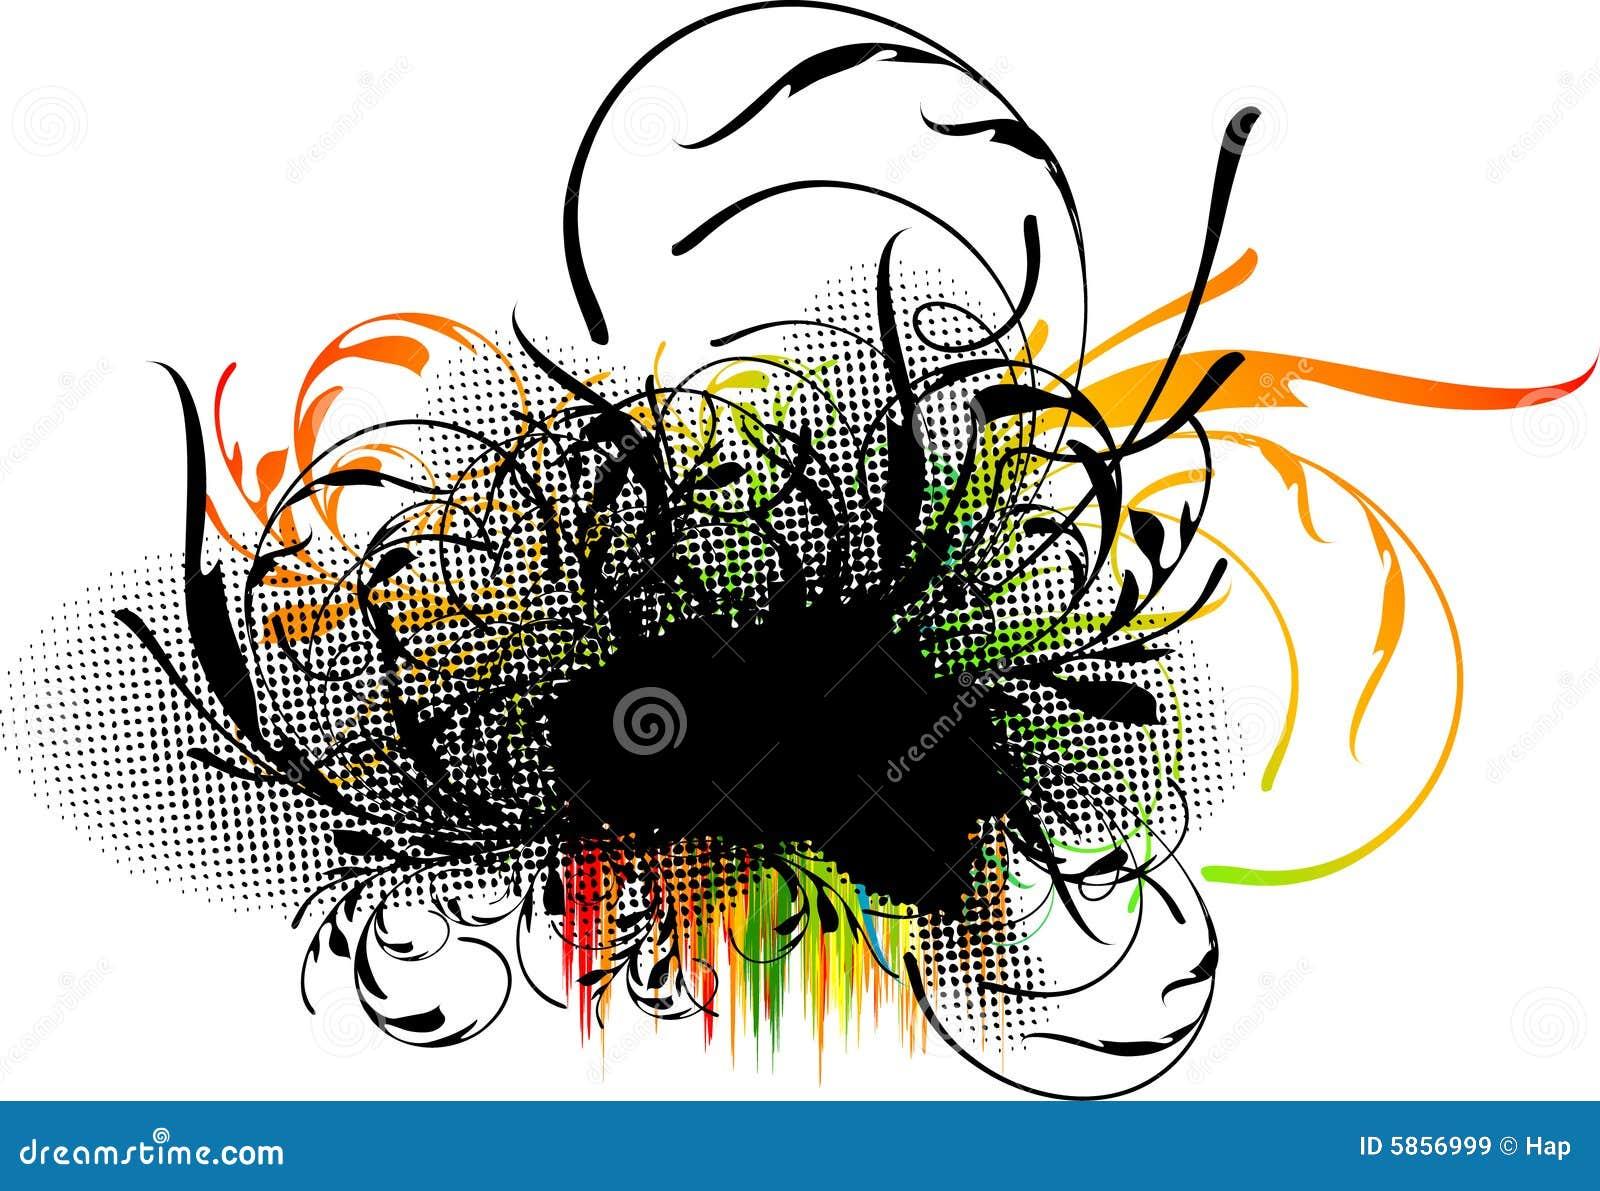 Grunge floral decoration royalty free stock images image 5856999 - Grune dekoration ...